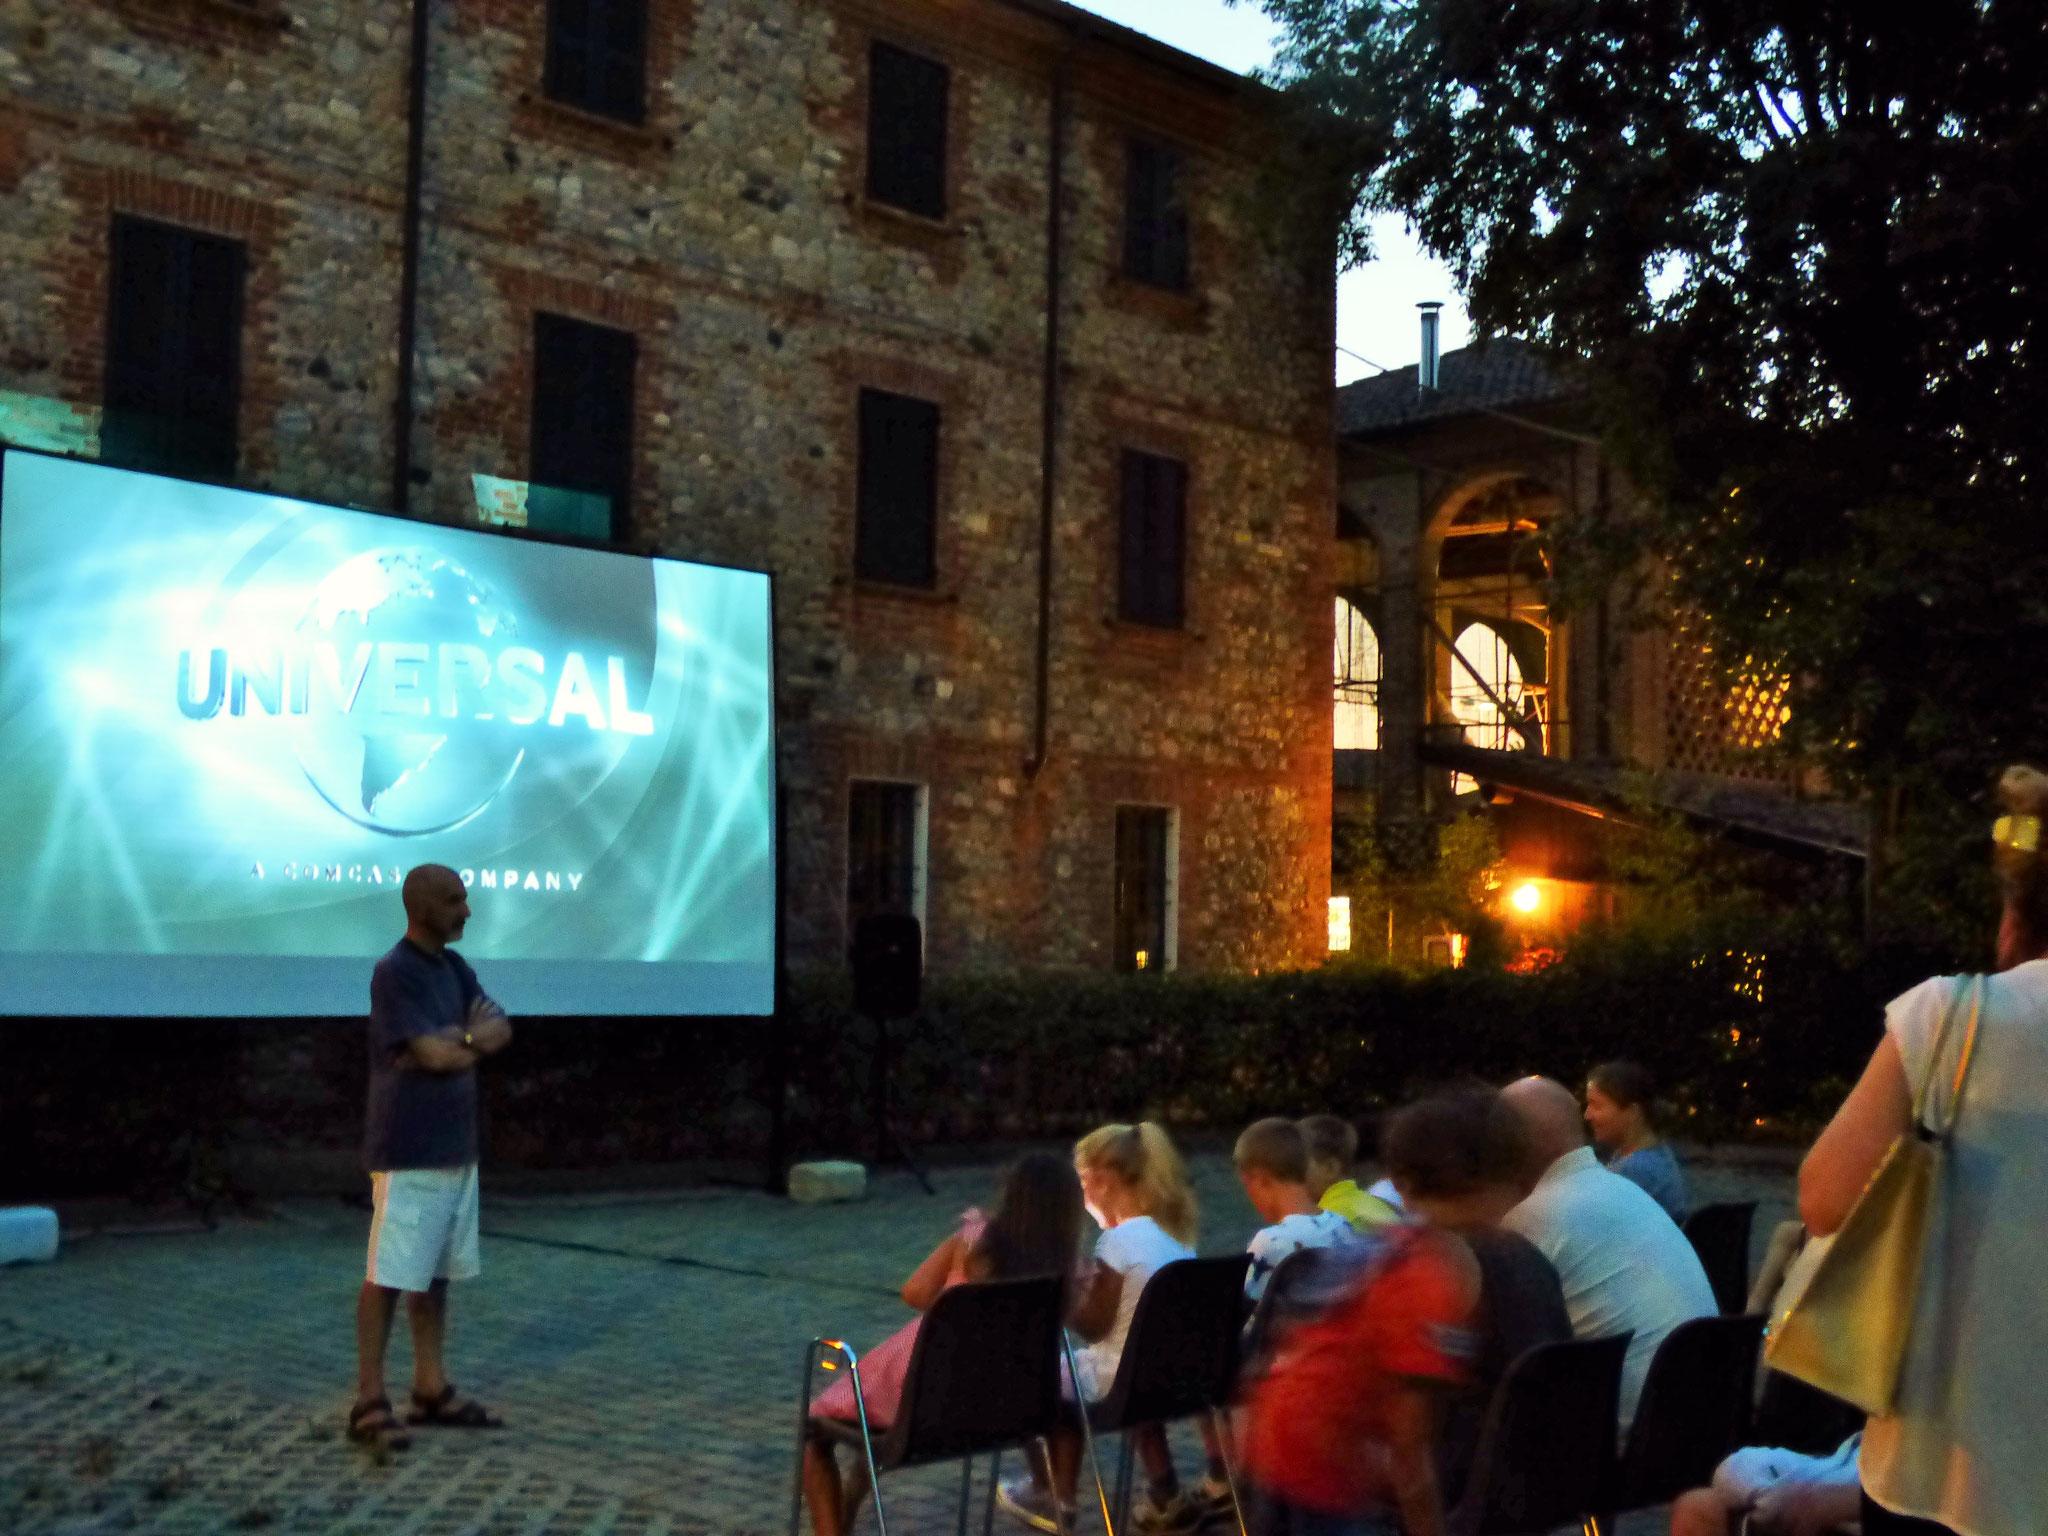 Rivergaro giardino Anguissola 19 luglio KUBO E LA SPADA MAGICA